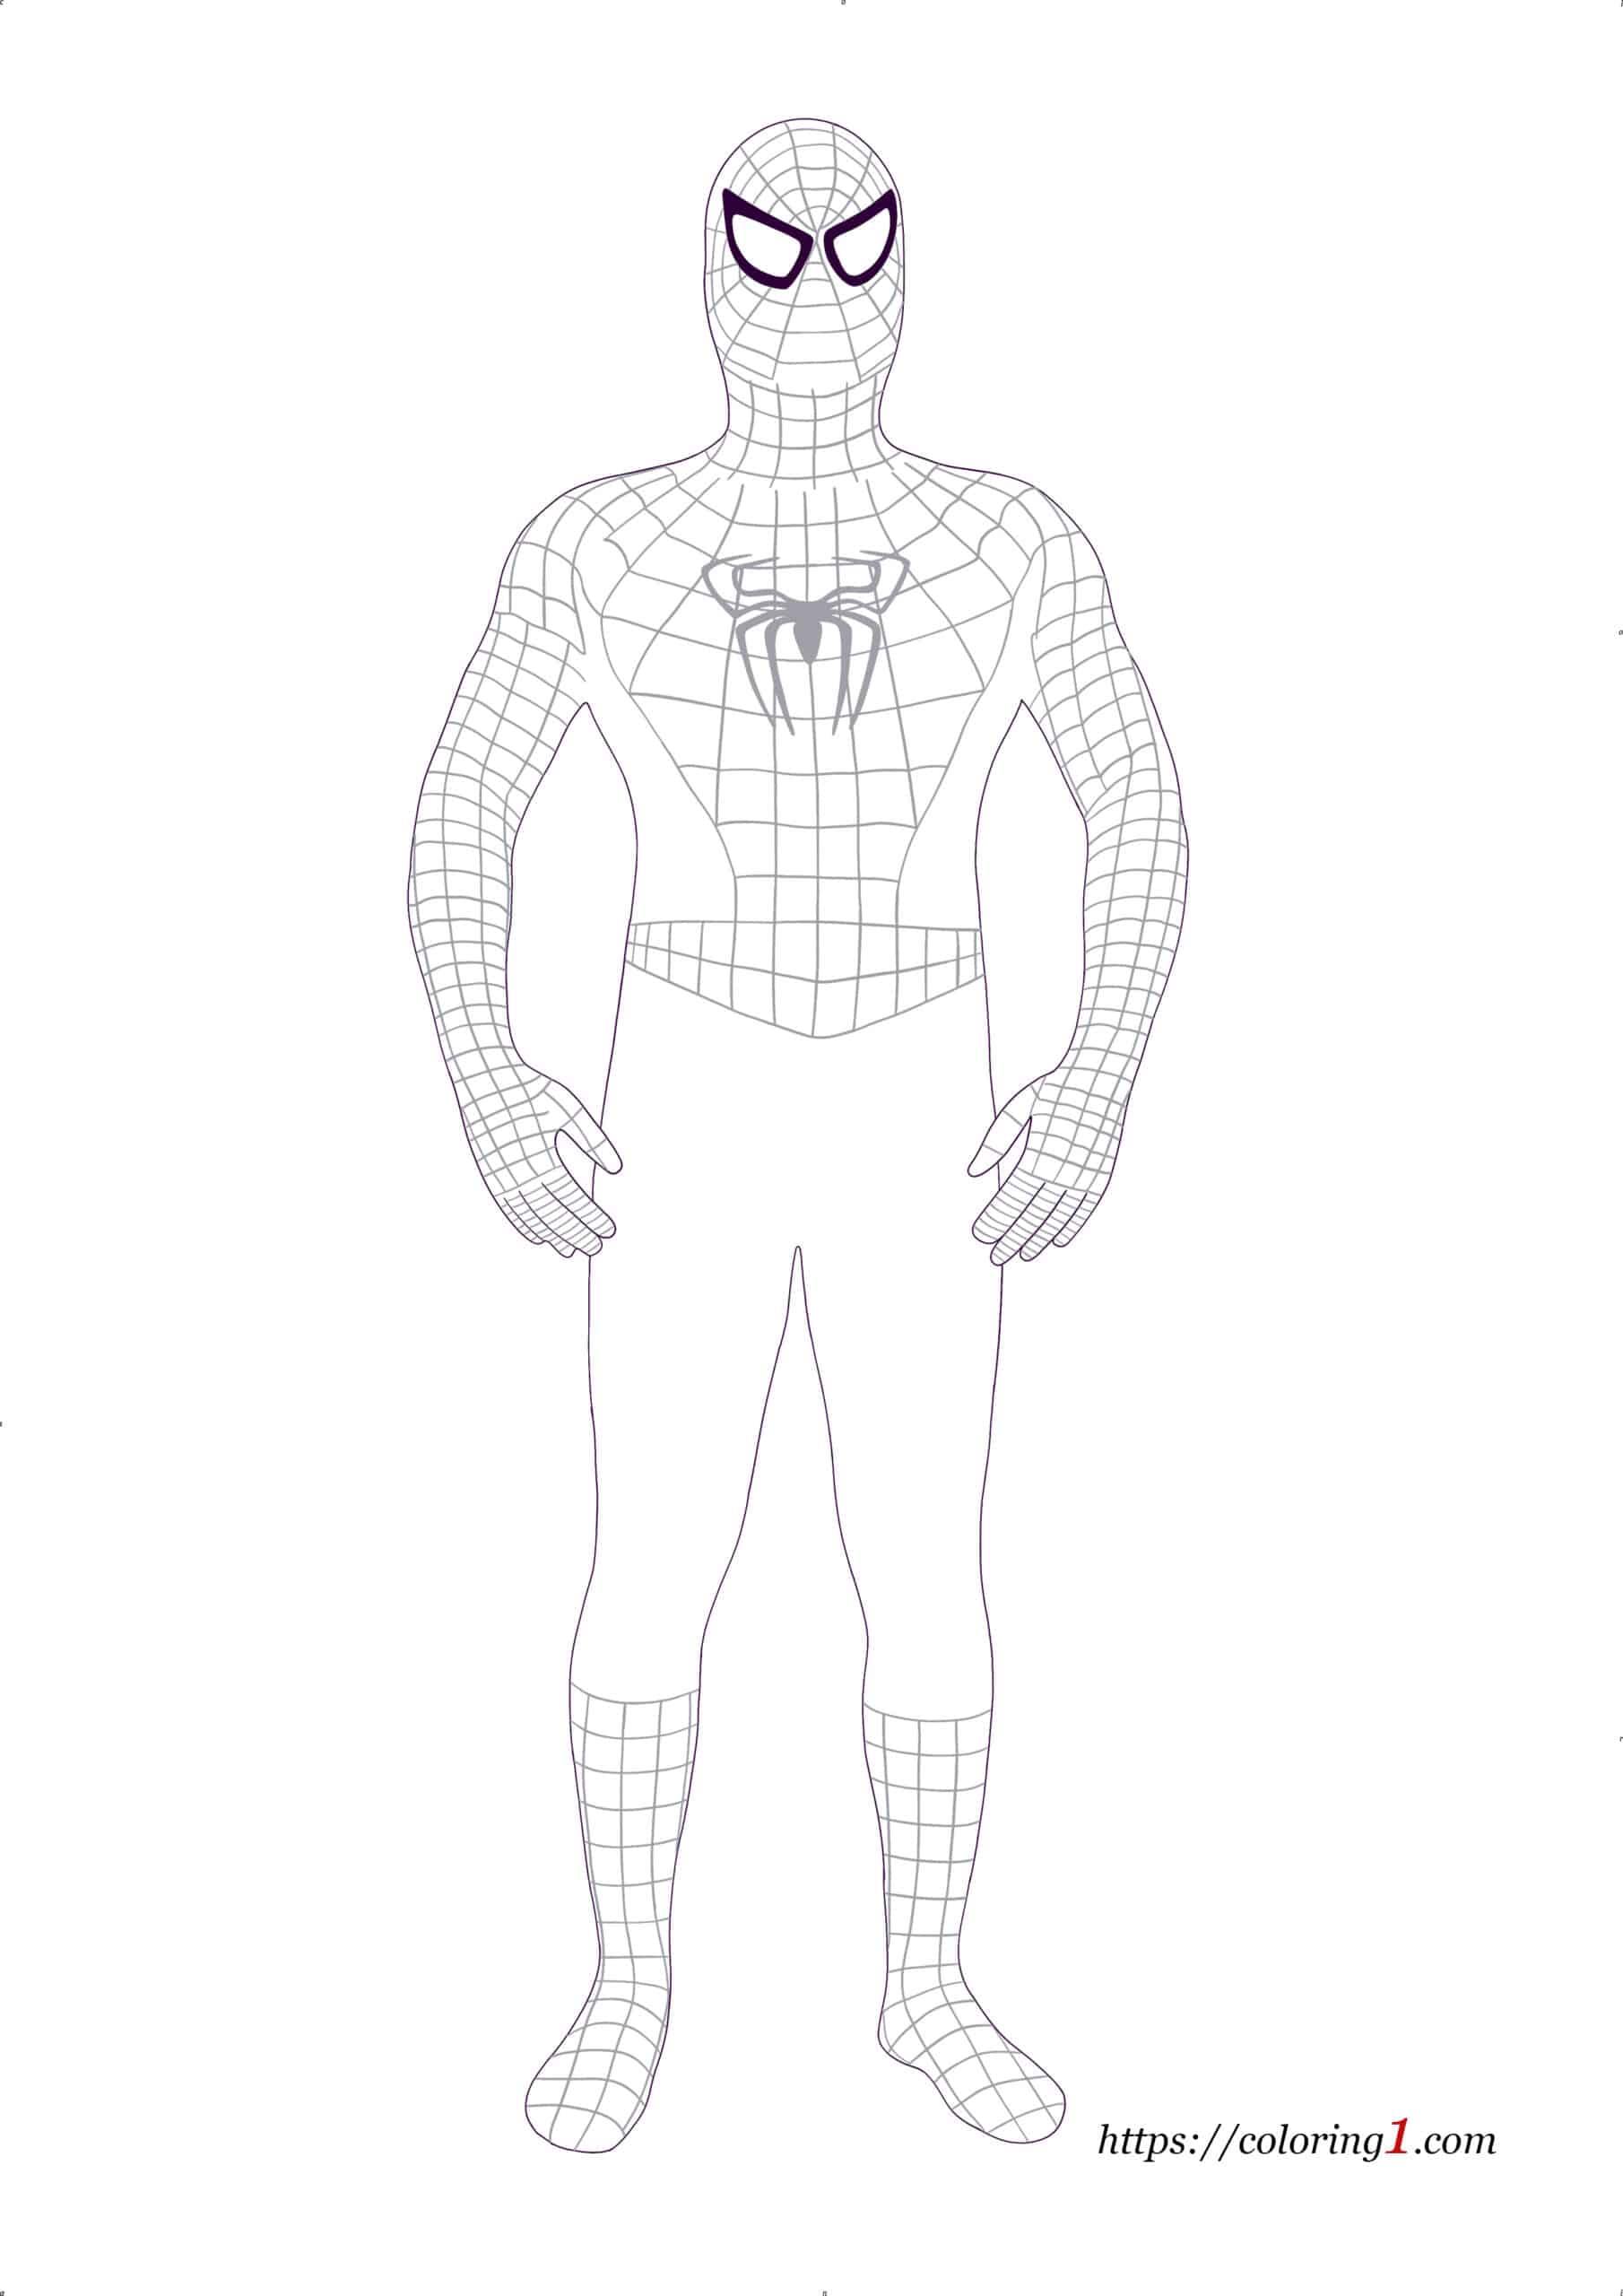 Black Spiderman coloring page